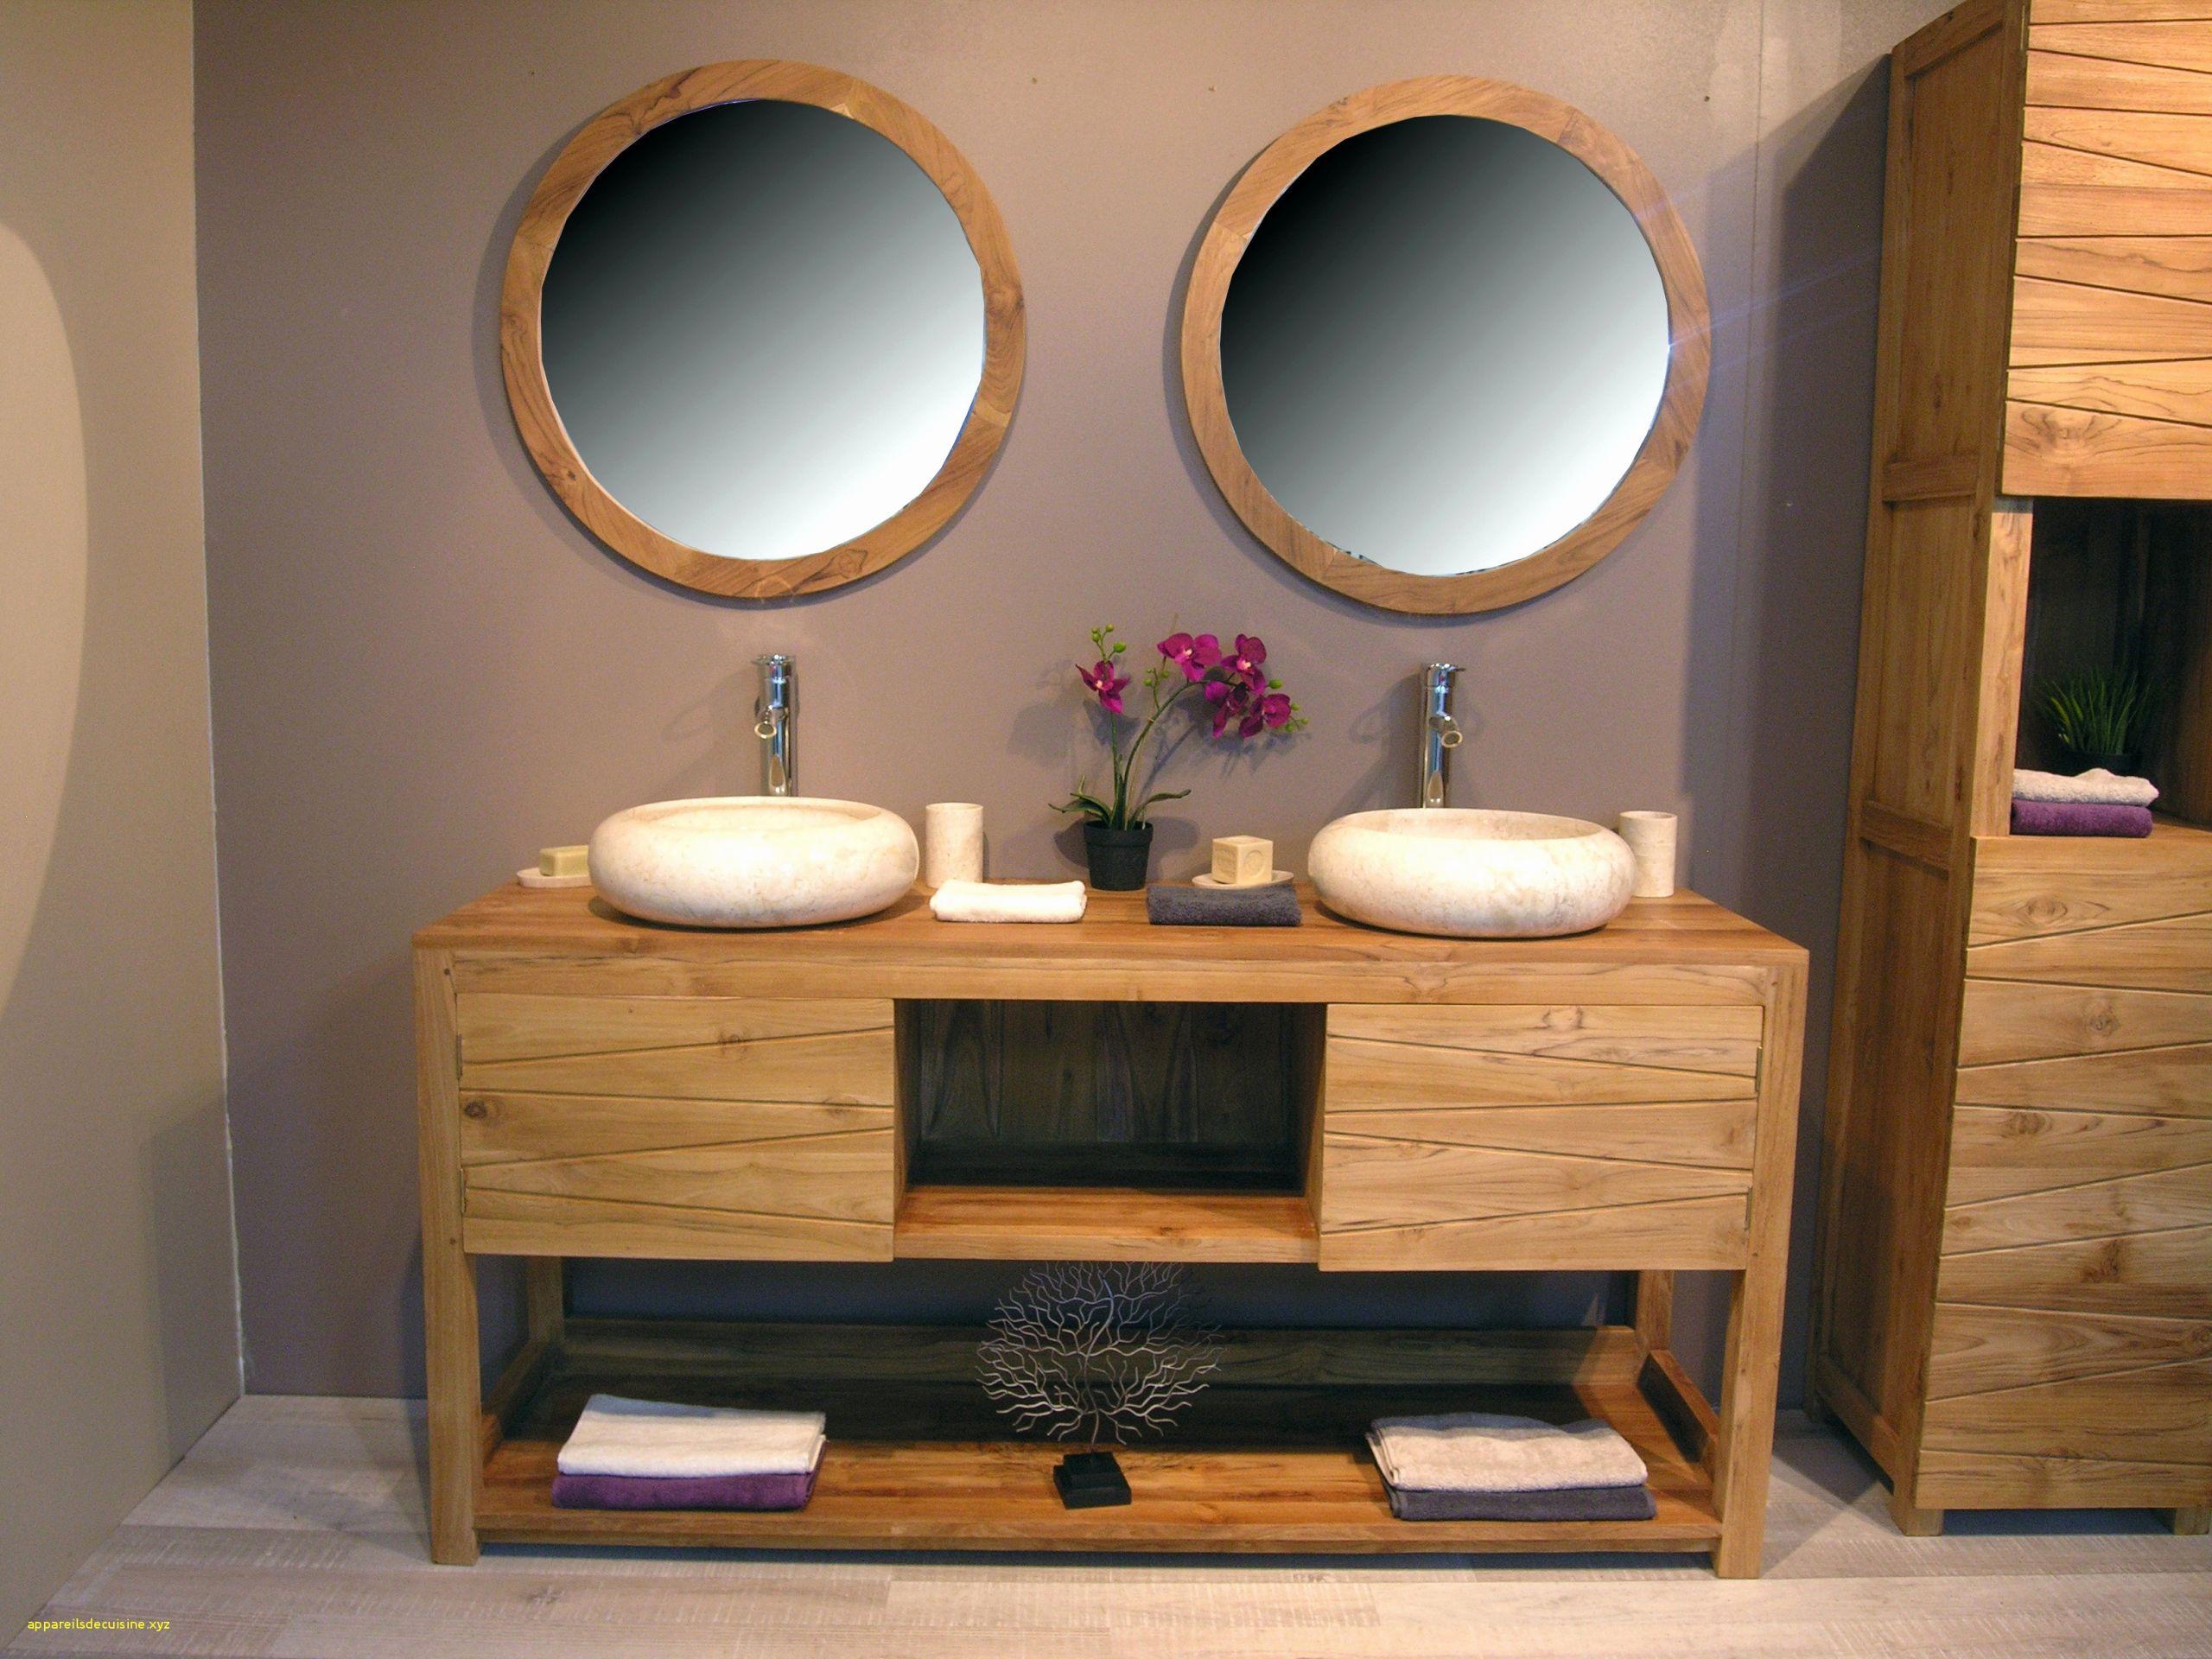 element cuisine brico depot luxe fascinant brico depot meuble salle de bain avec meuble salle de bain of element cuisine brico depot